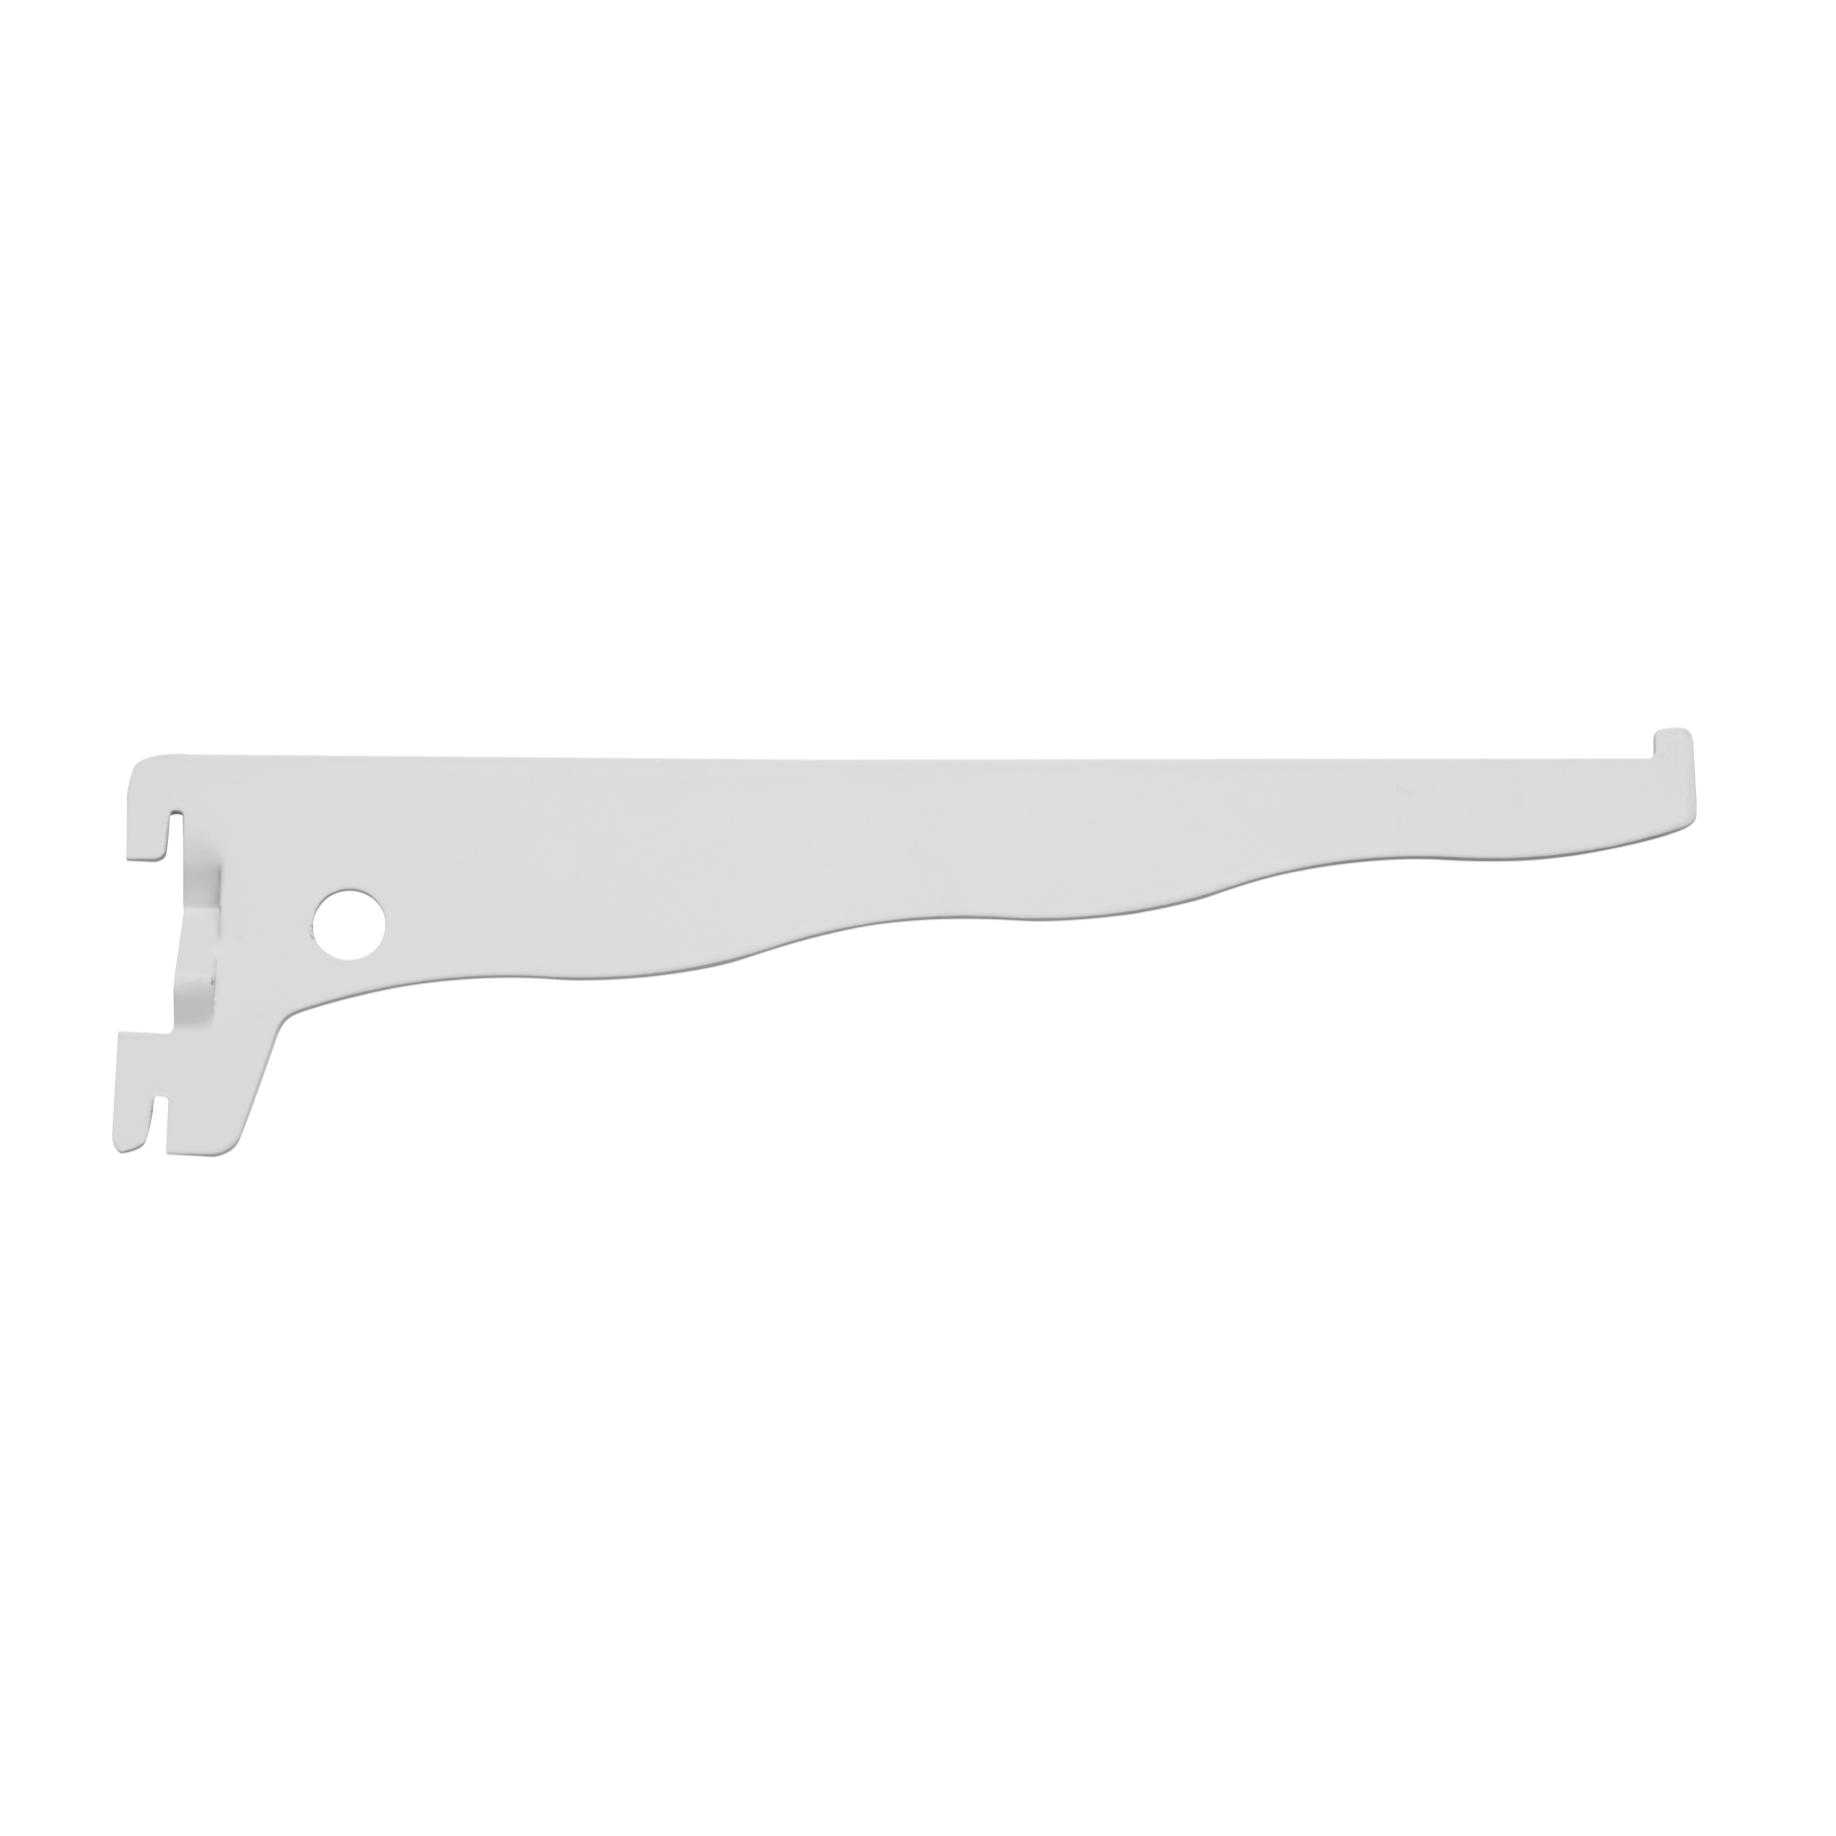 Suporte para Trilho de Aco 30 cm Branco 030 - Prat-k